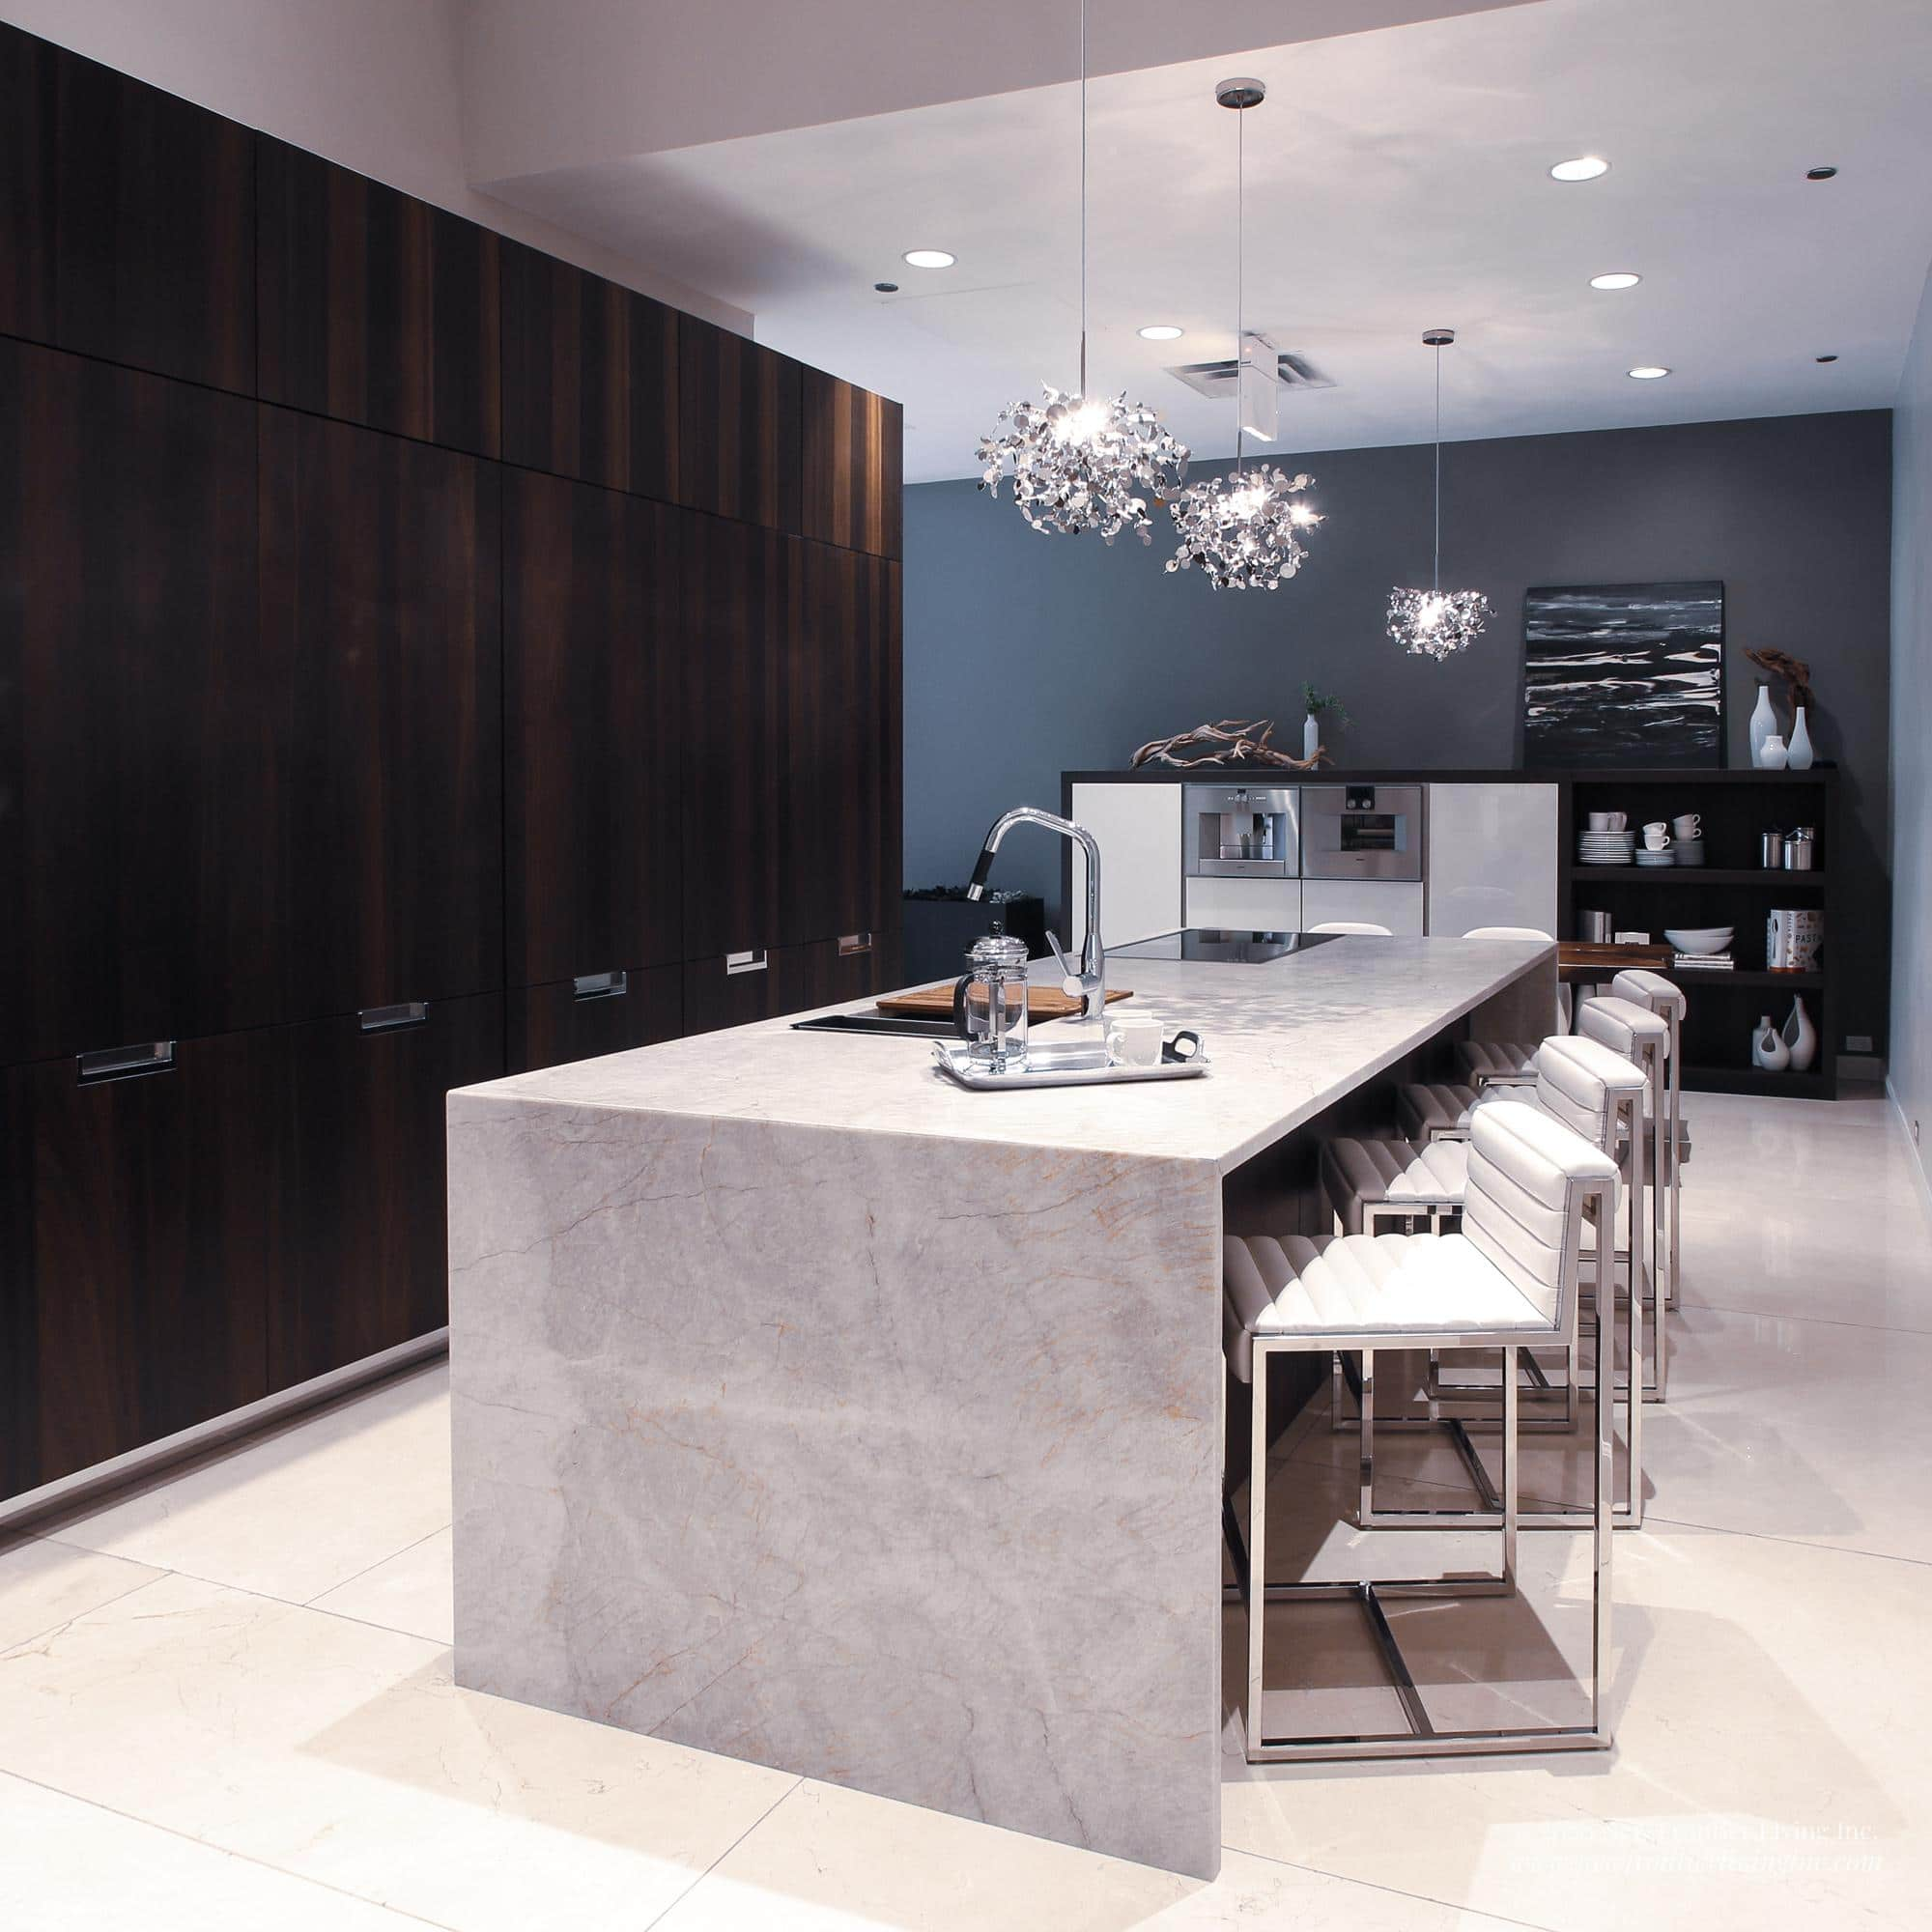 Black and cream kitchen with cream waterfall island